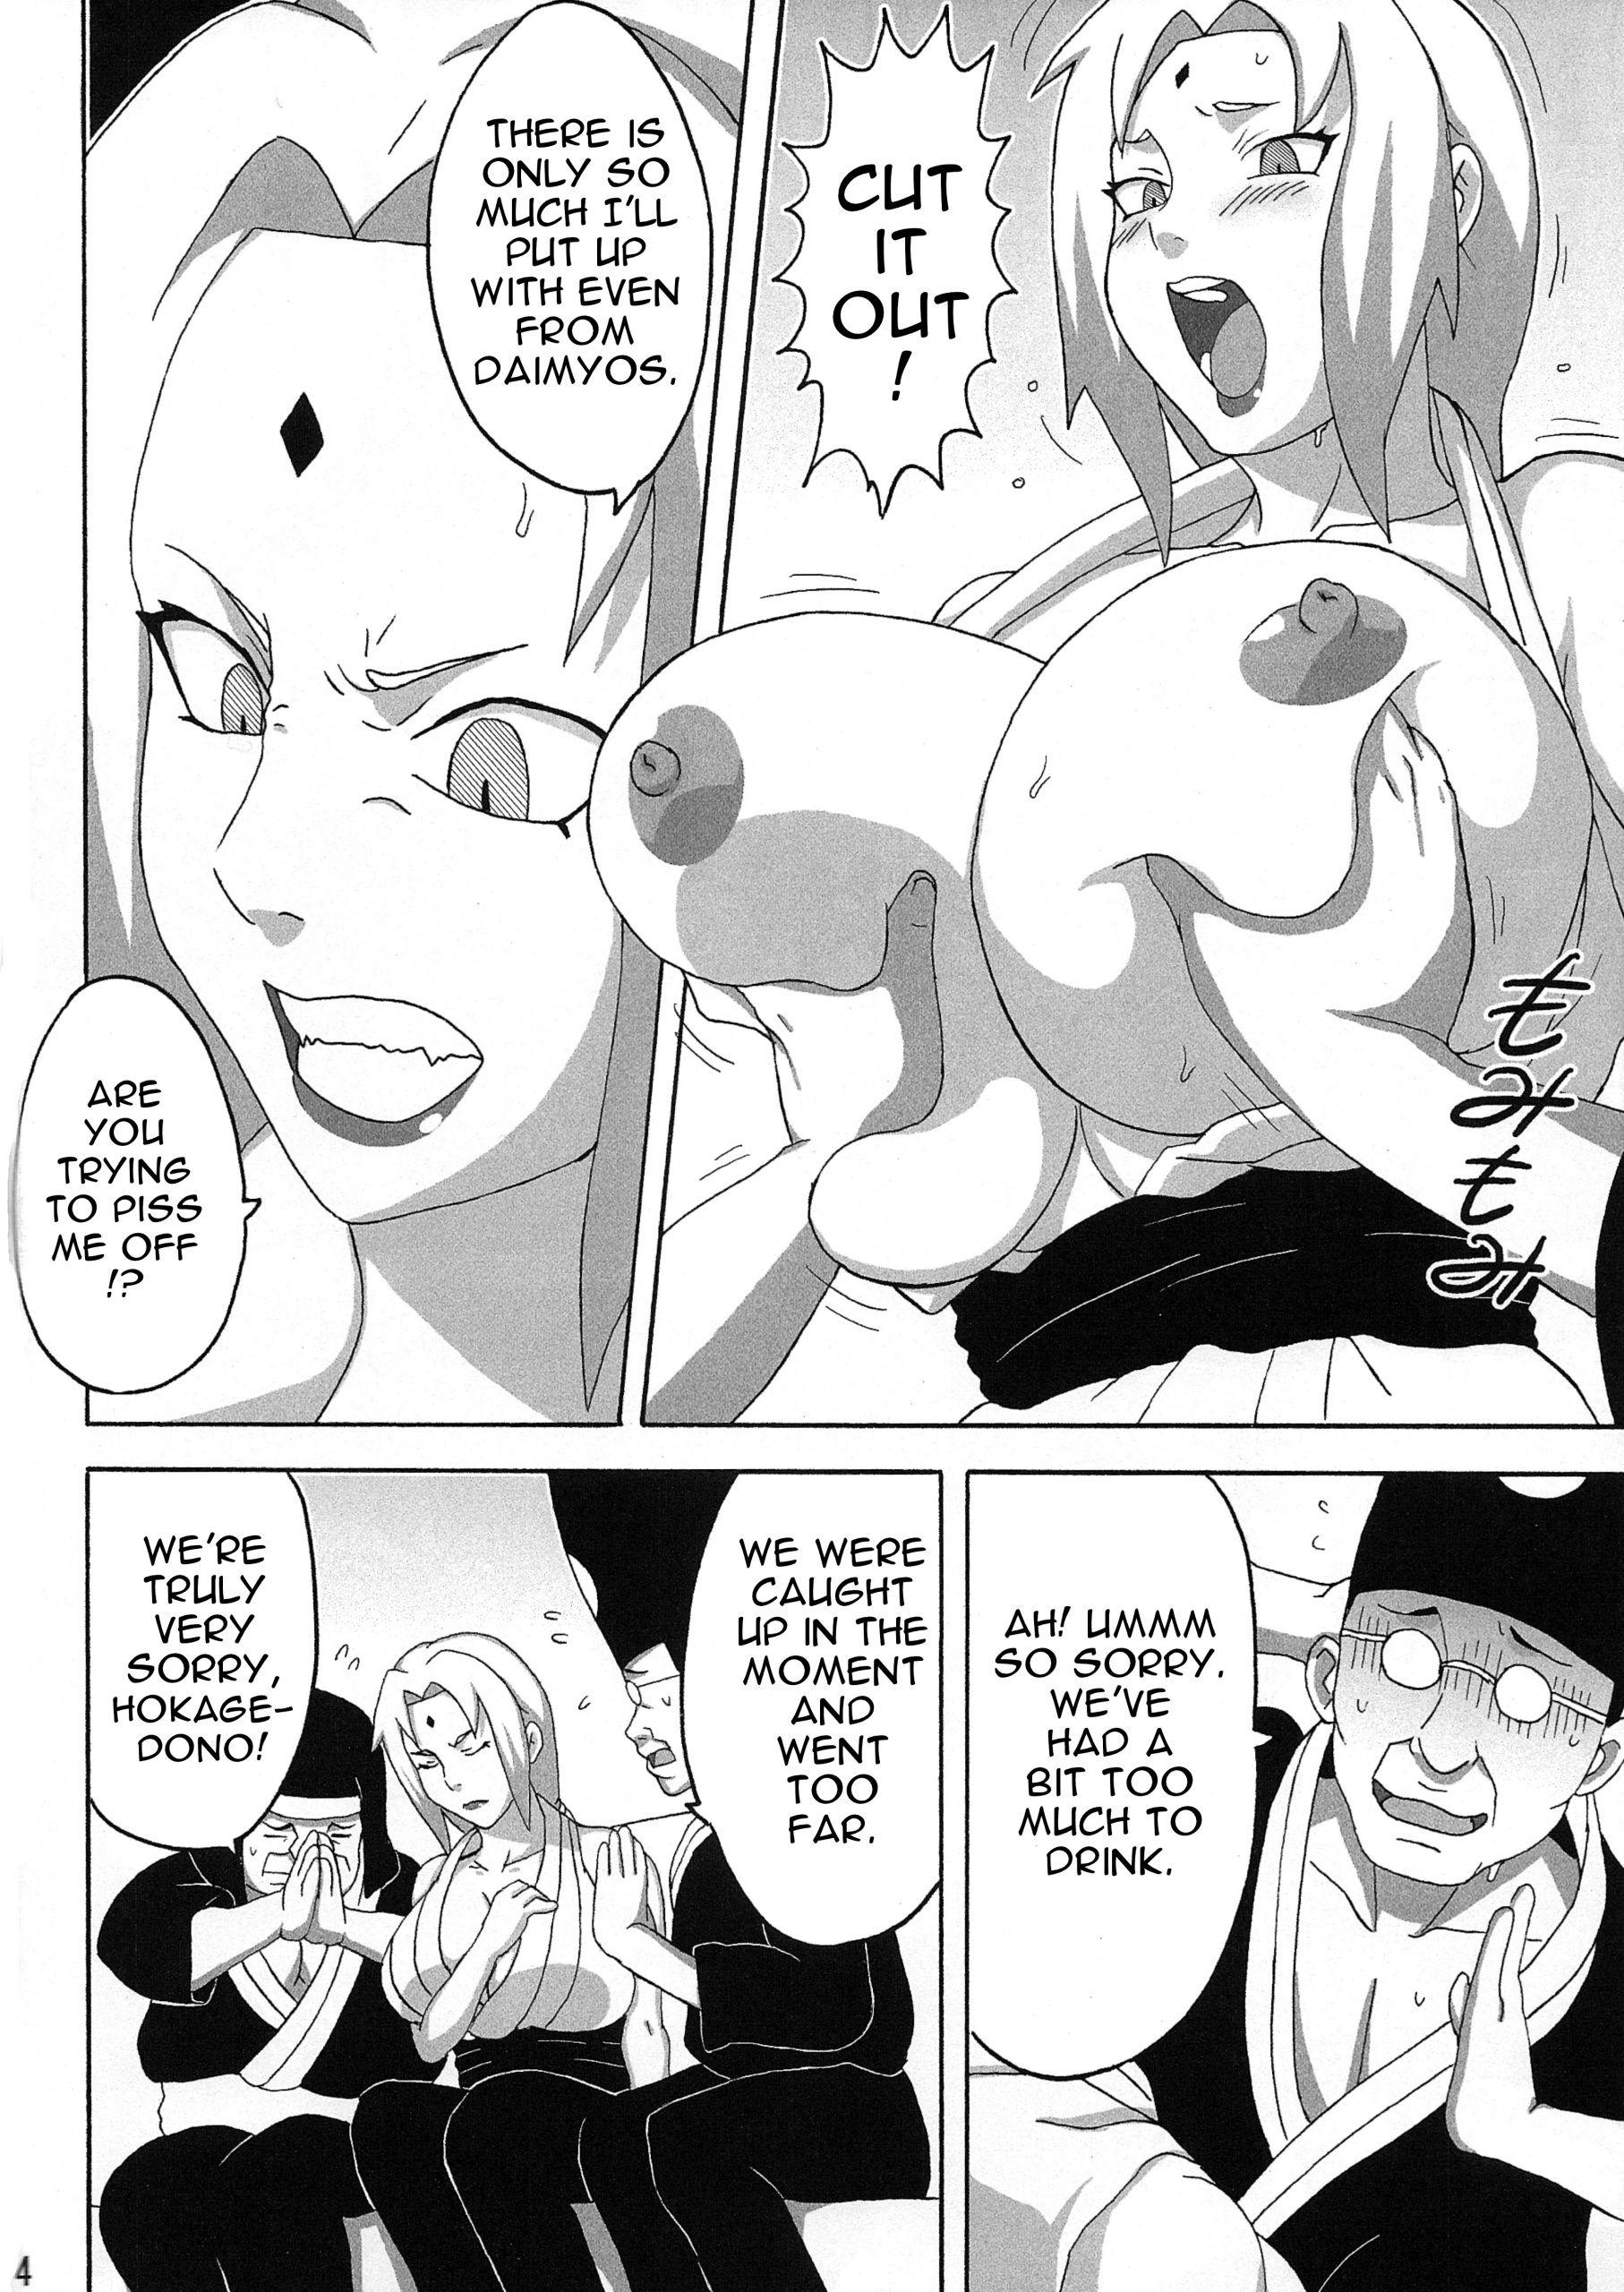 Tsunades lewd reception party hentai manga picture 5